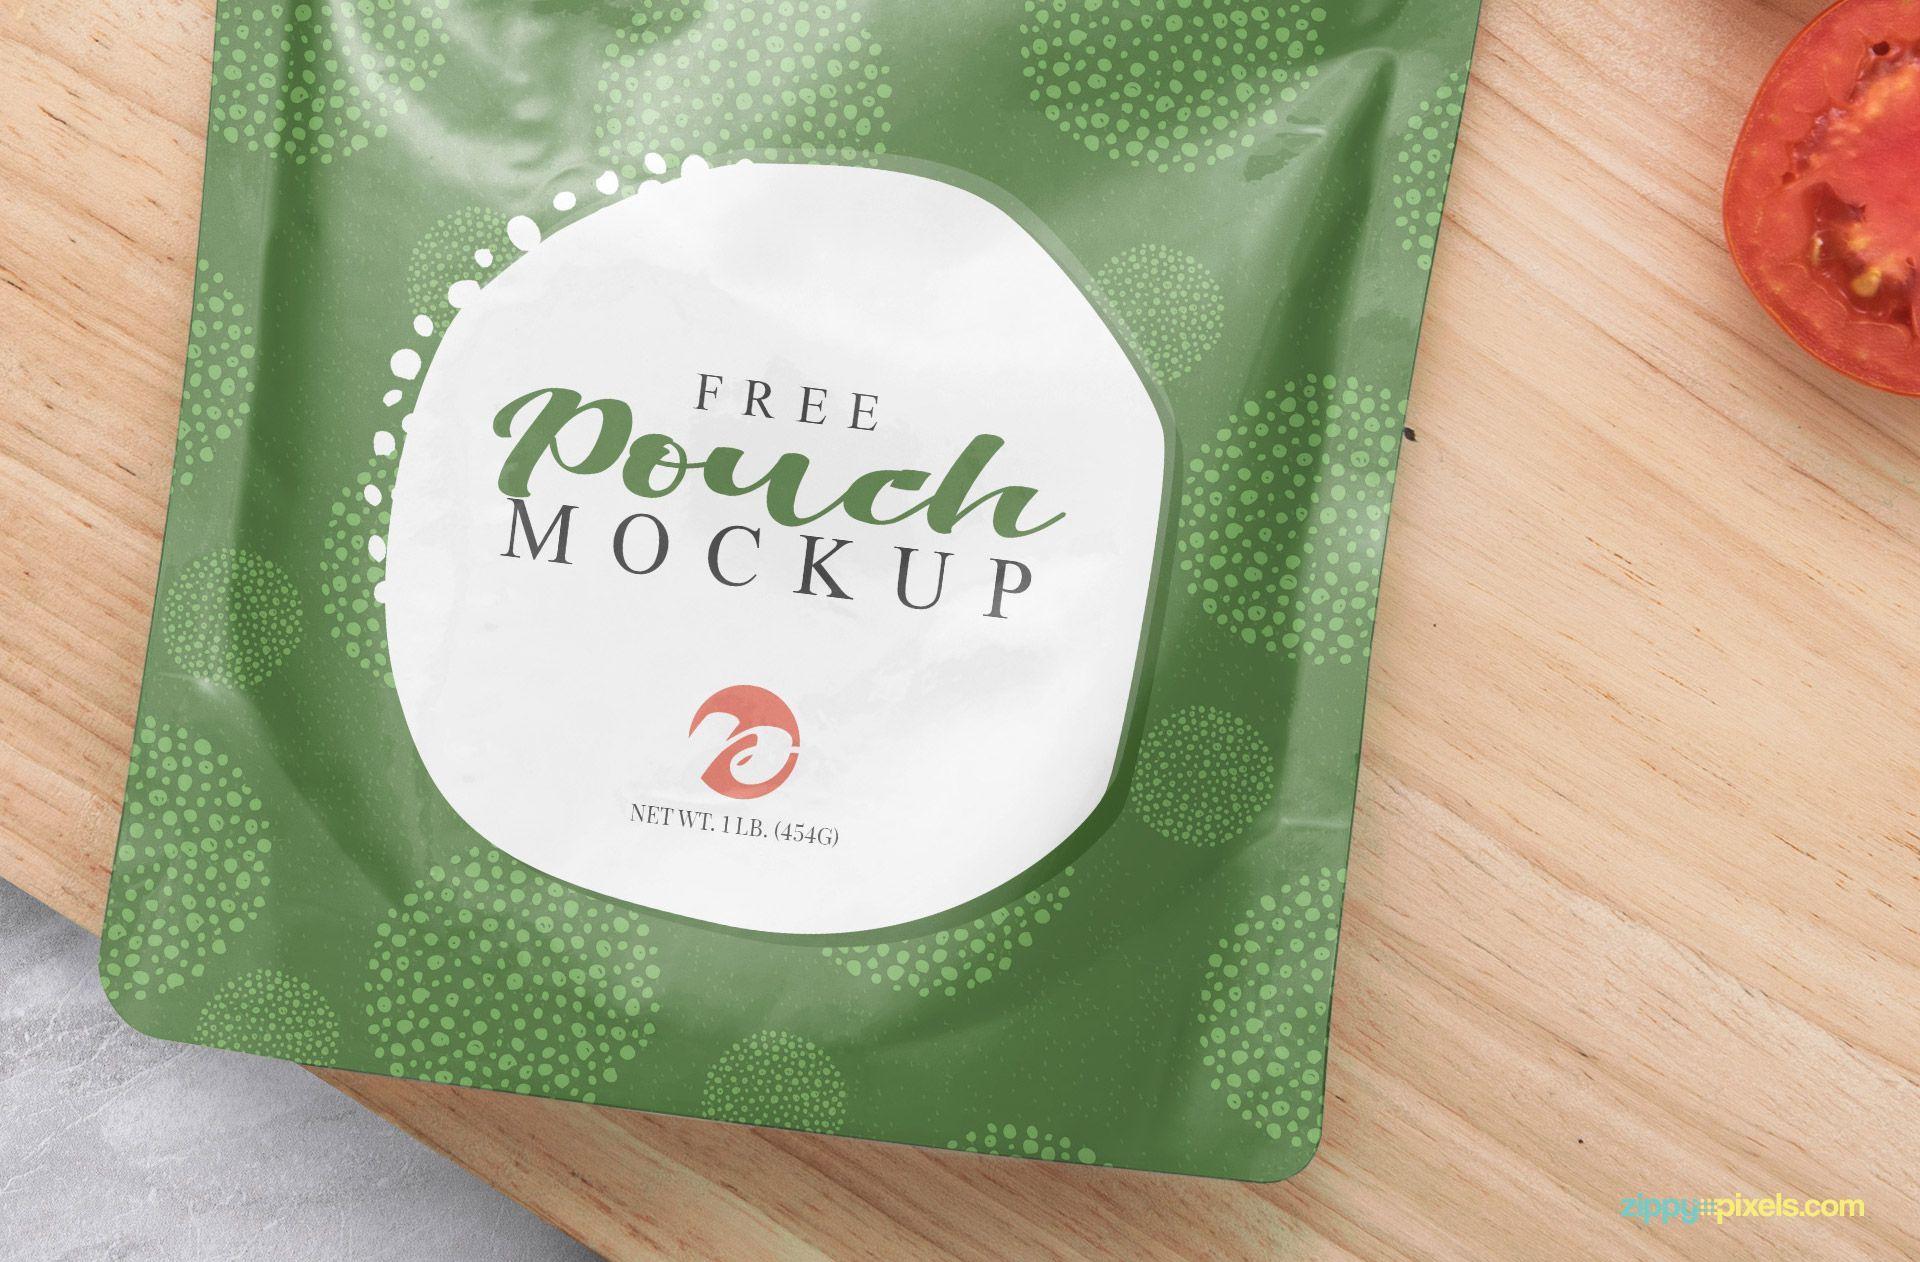 Download Sealed Sachet Mockup Free Psd Zippypixels Mockup Free Psd Packaging Mockup Free Mockup